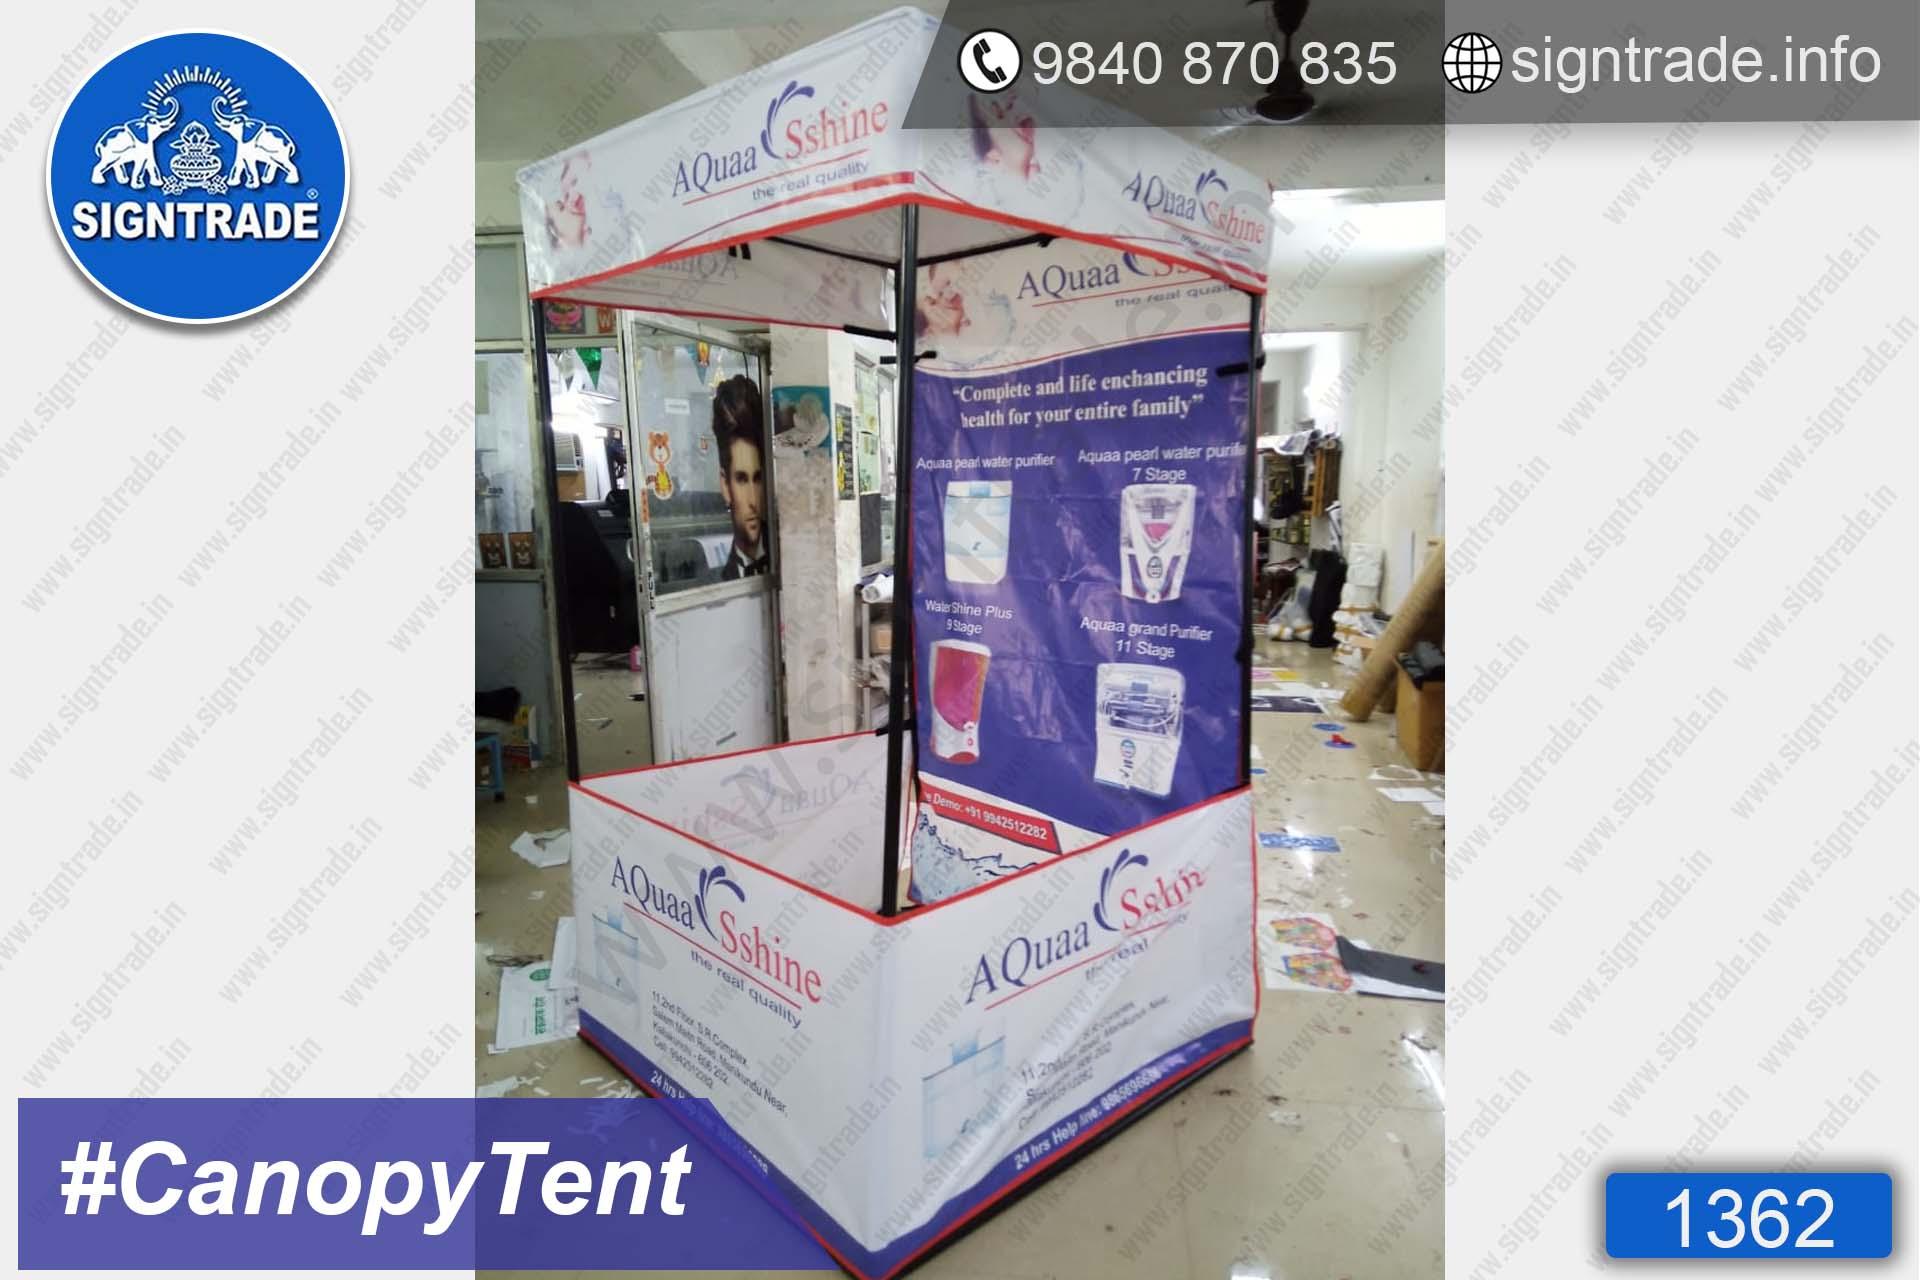 Aqua Shine - Chennai - SIGNTRADE - Canopy Tent Manufactures in Chennai